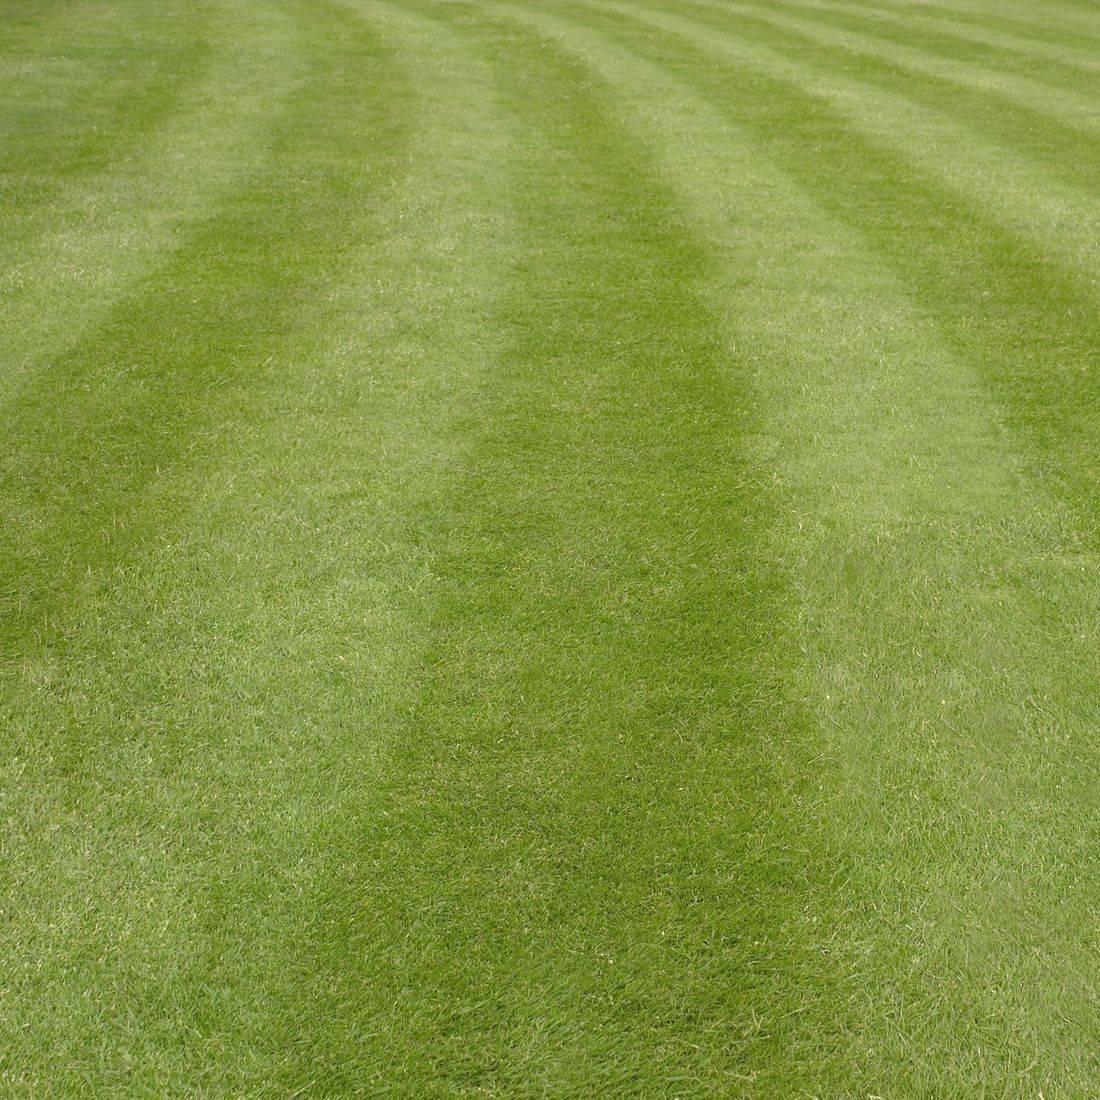 herzberg lawn care